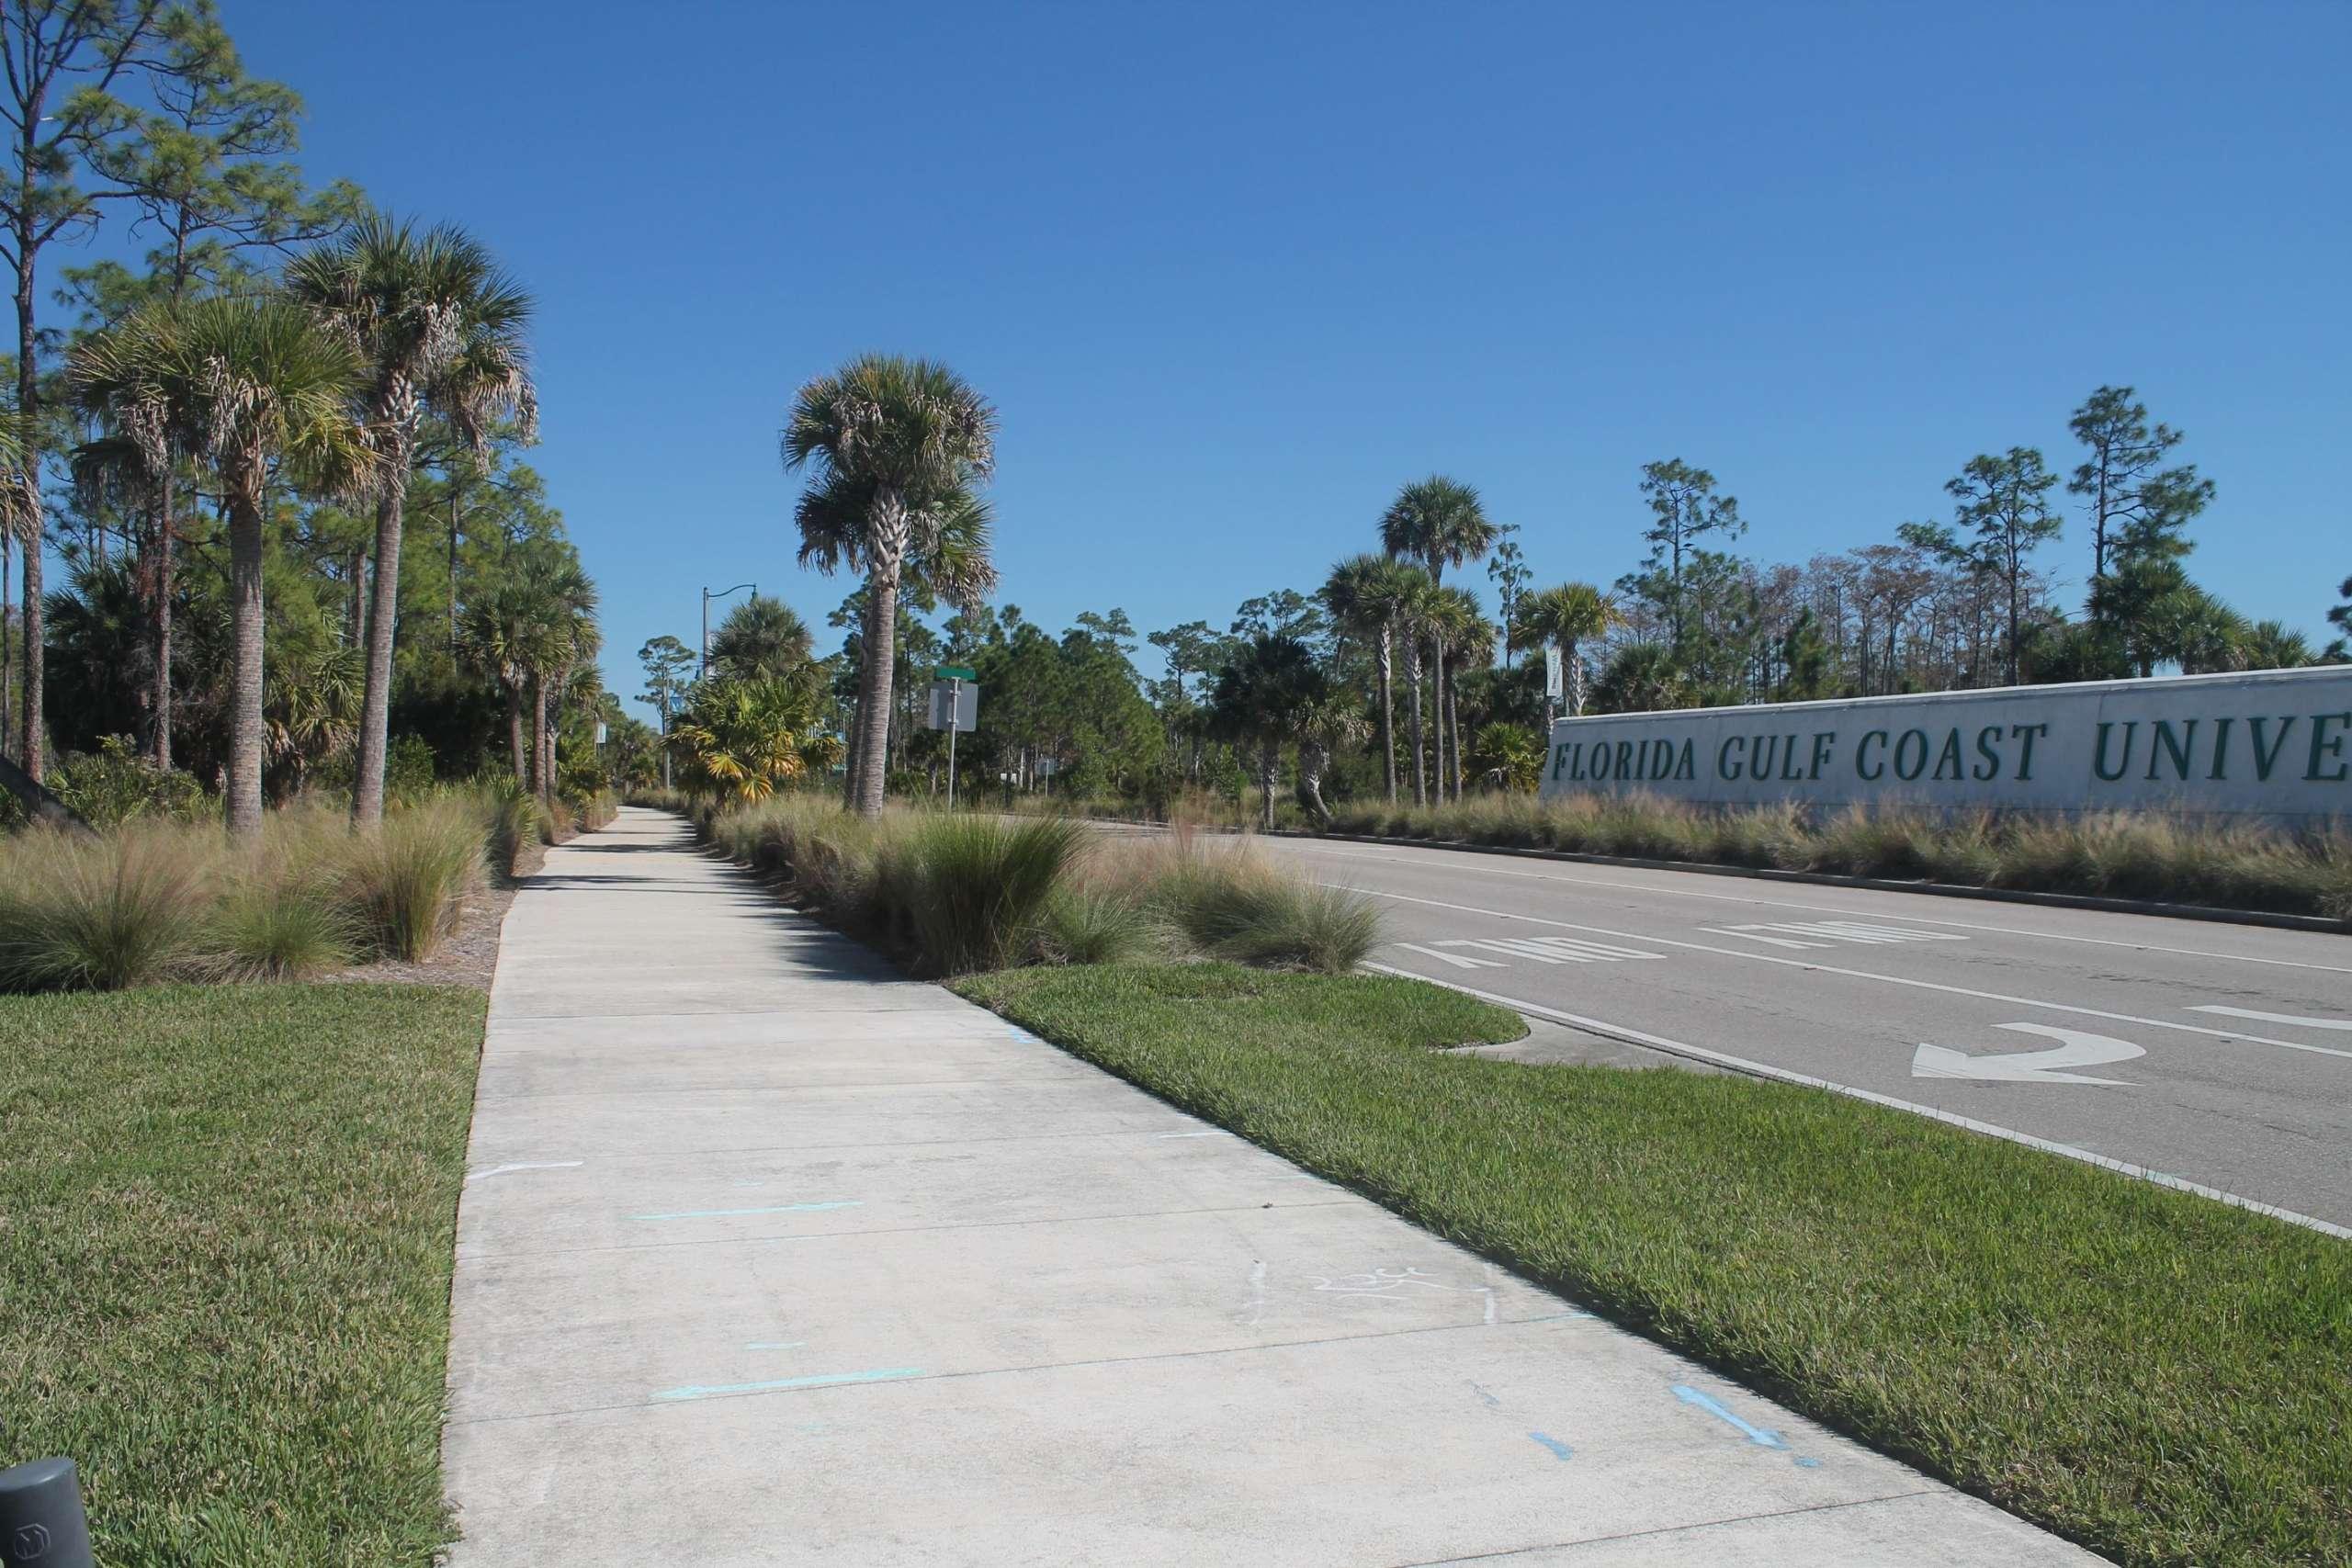 FGCU Pathway